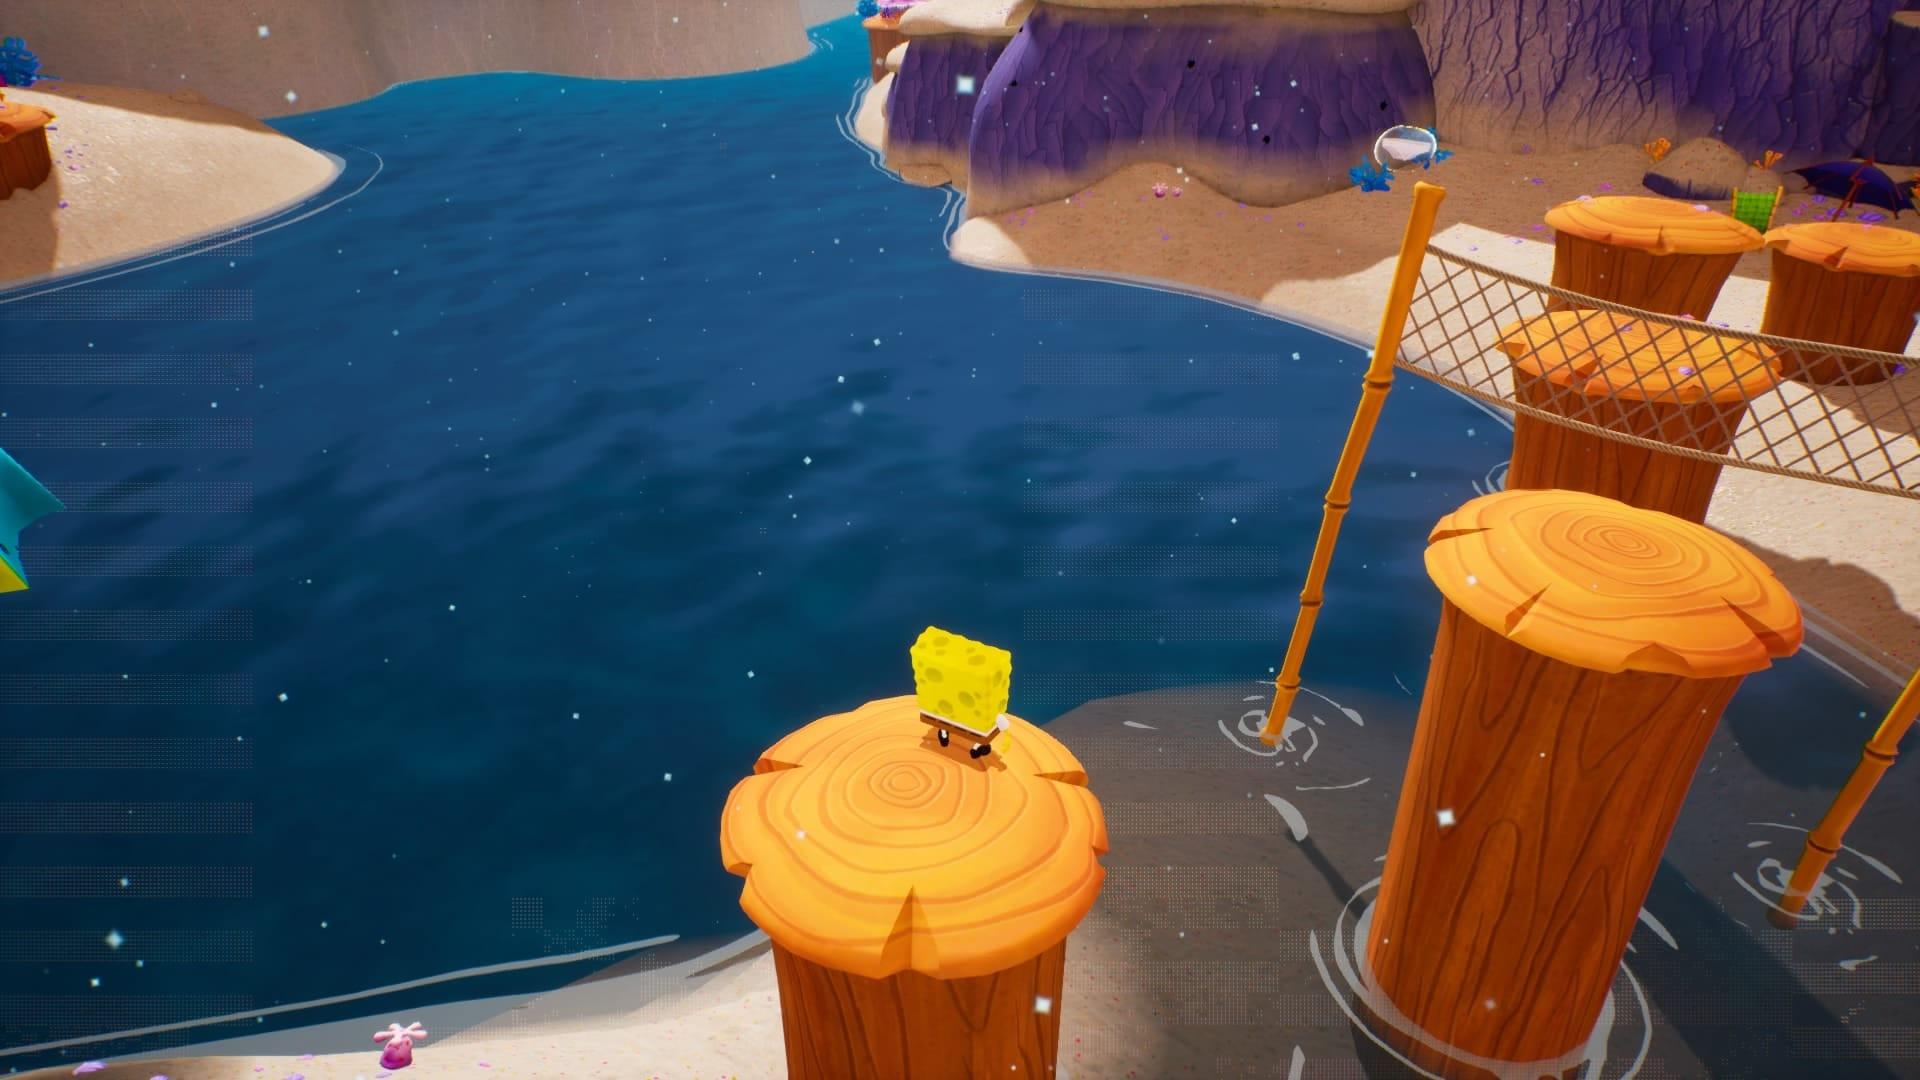 SpongeBob SquarePants: Battle for Bikini Bottom - Rehydrated: vale a pena? 7